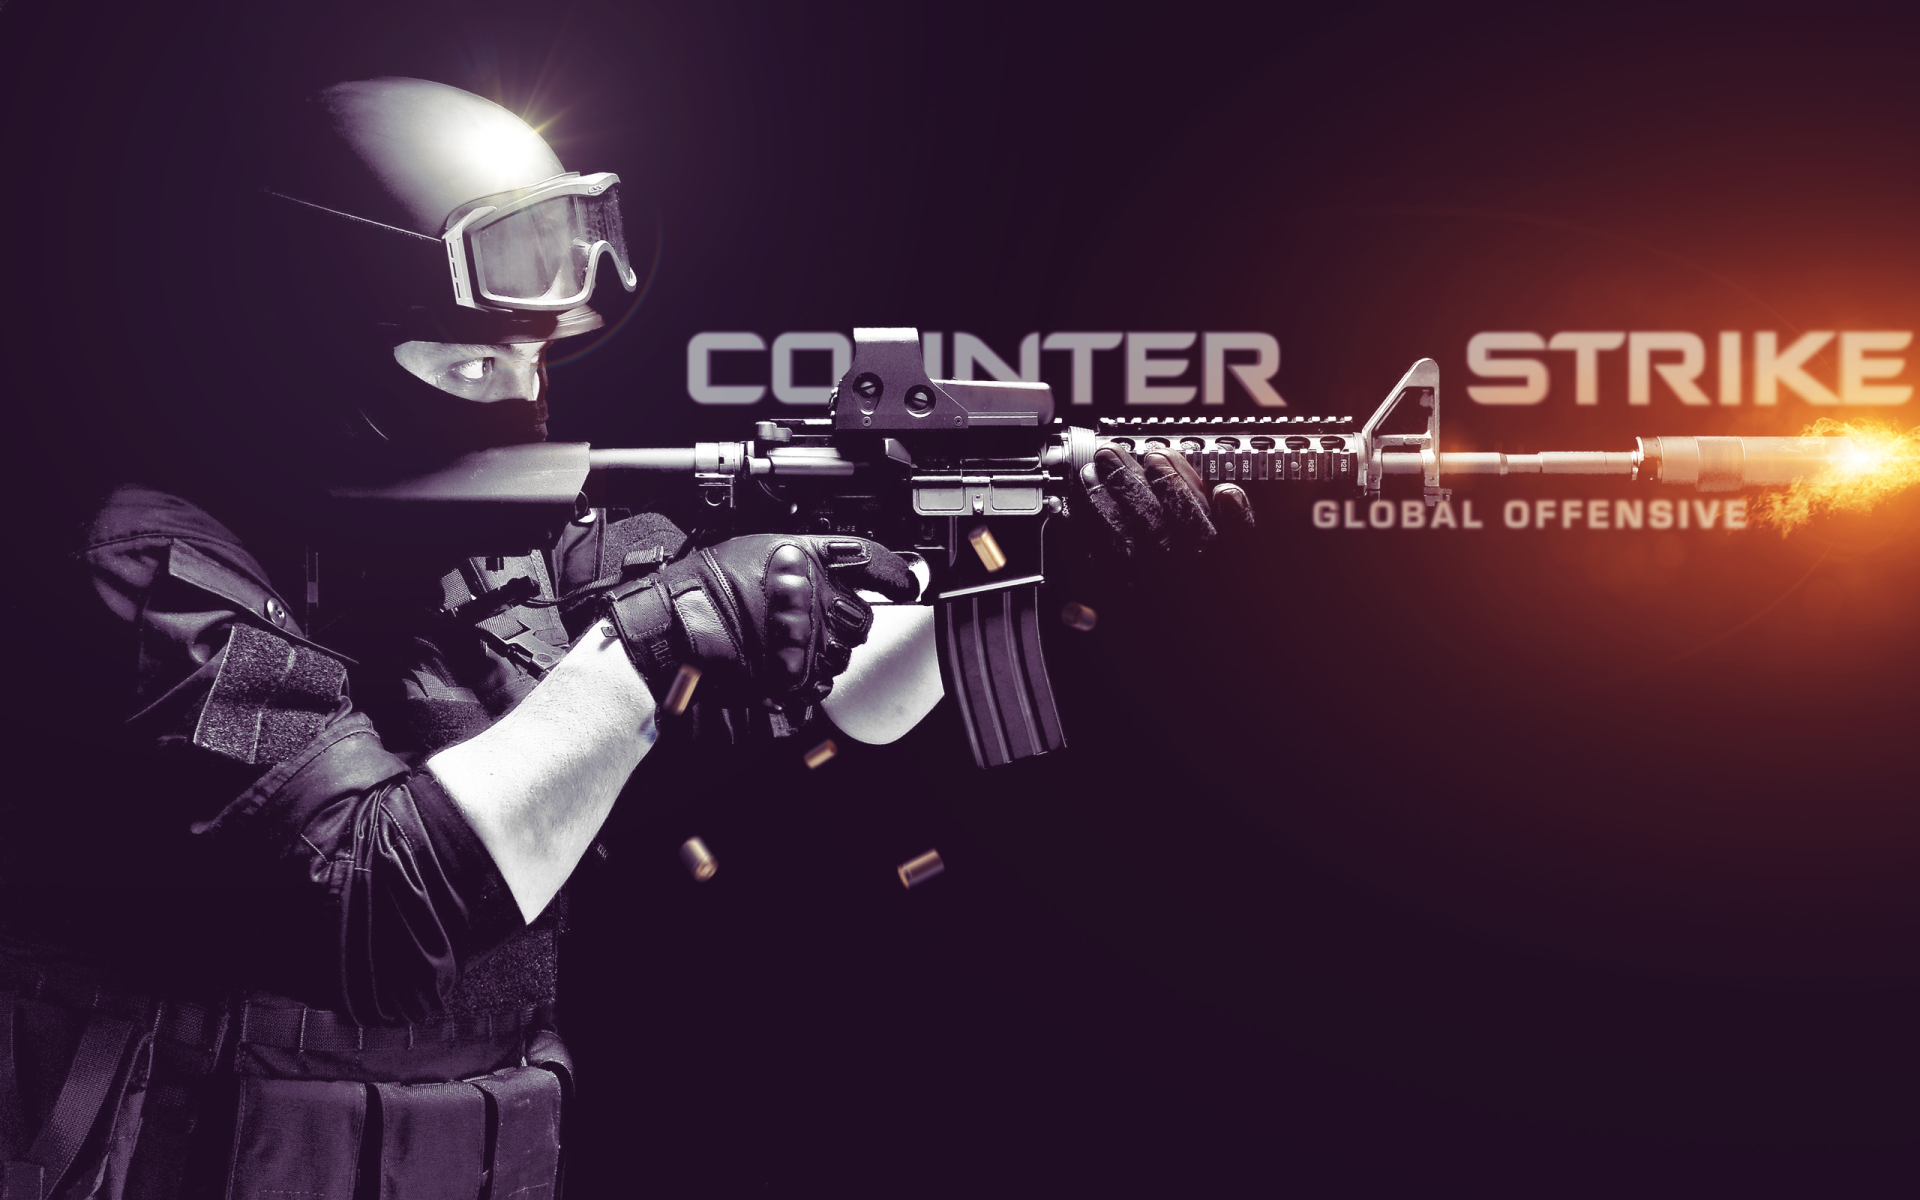 Counter Strike Global Offensive Fondo De Pantalla Hd